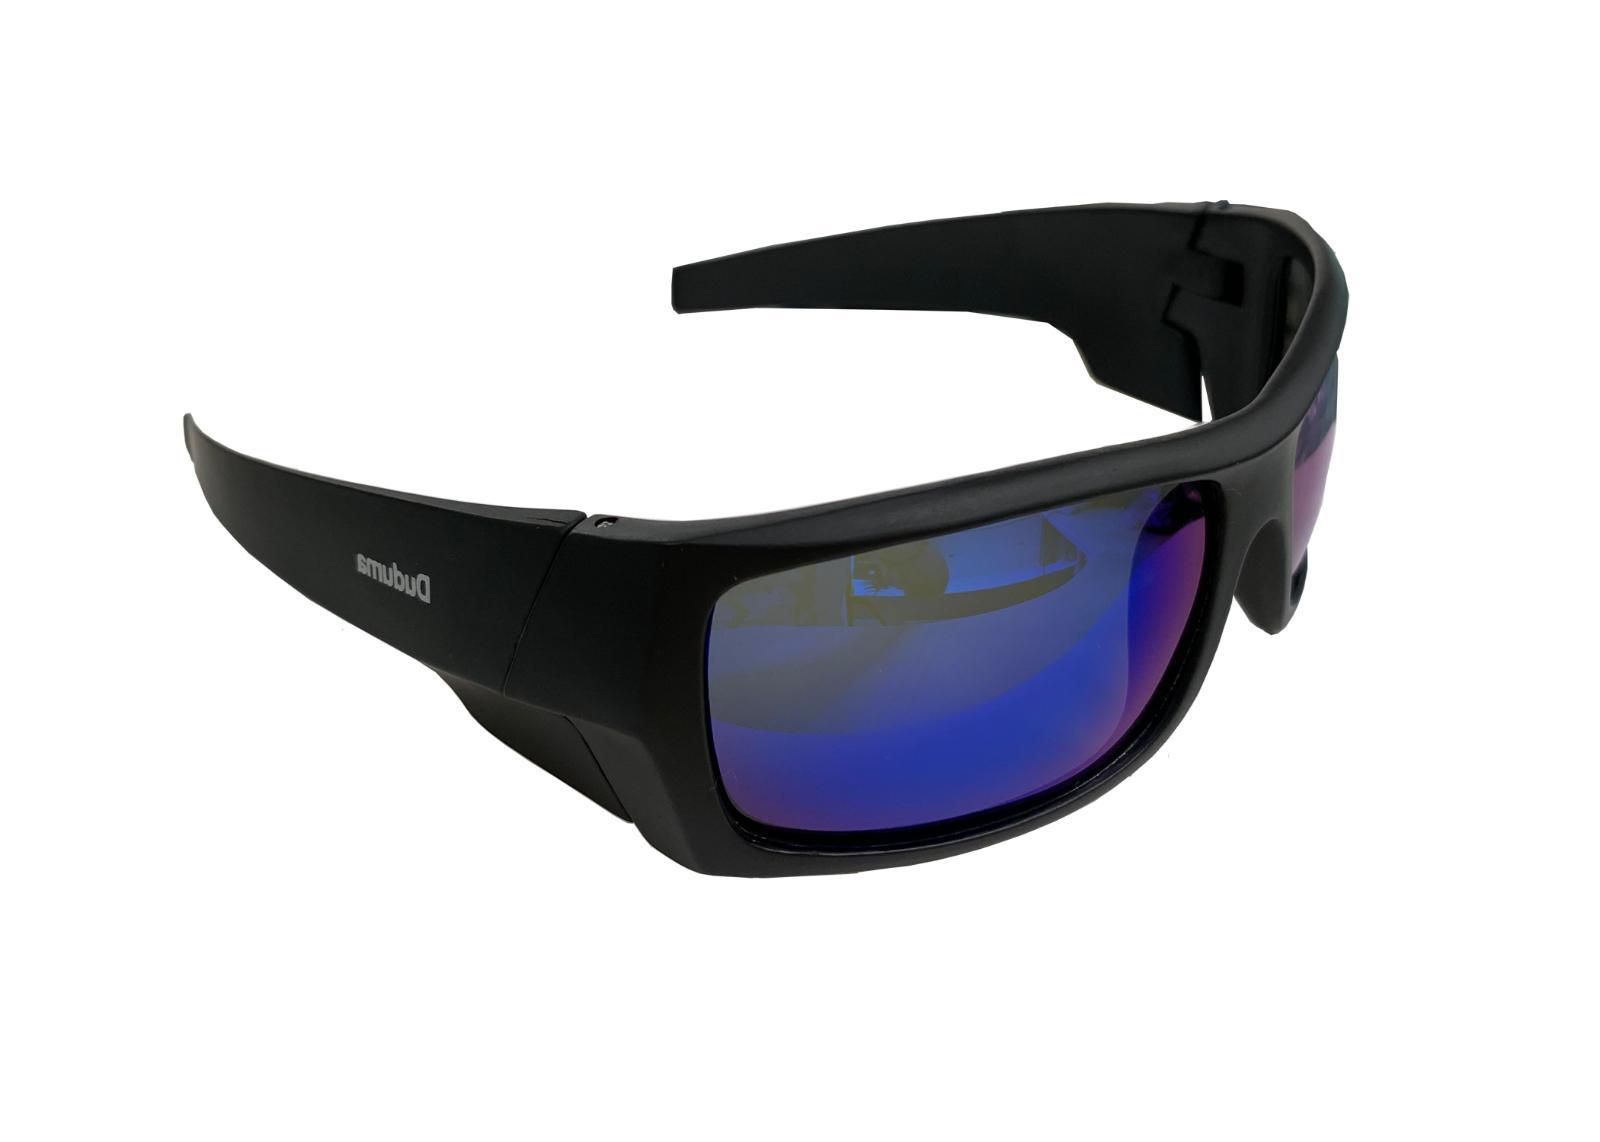 tr601 polarized sports sunglasses for men superlight